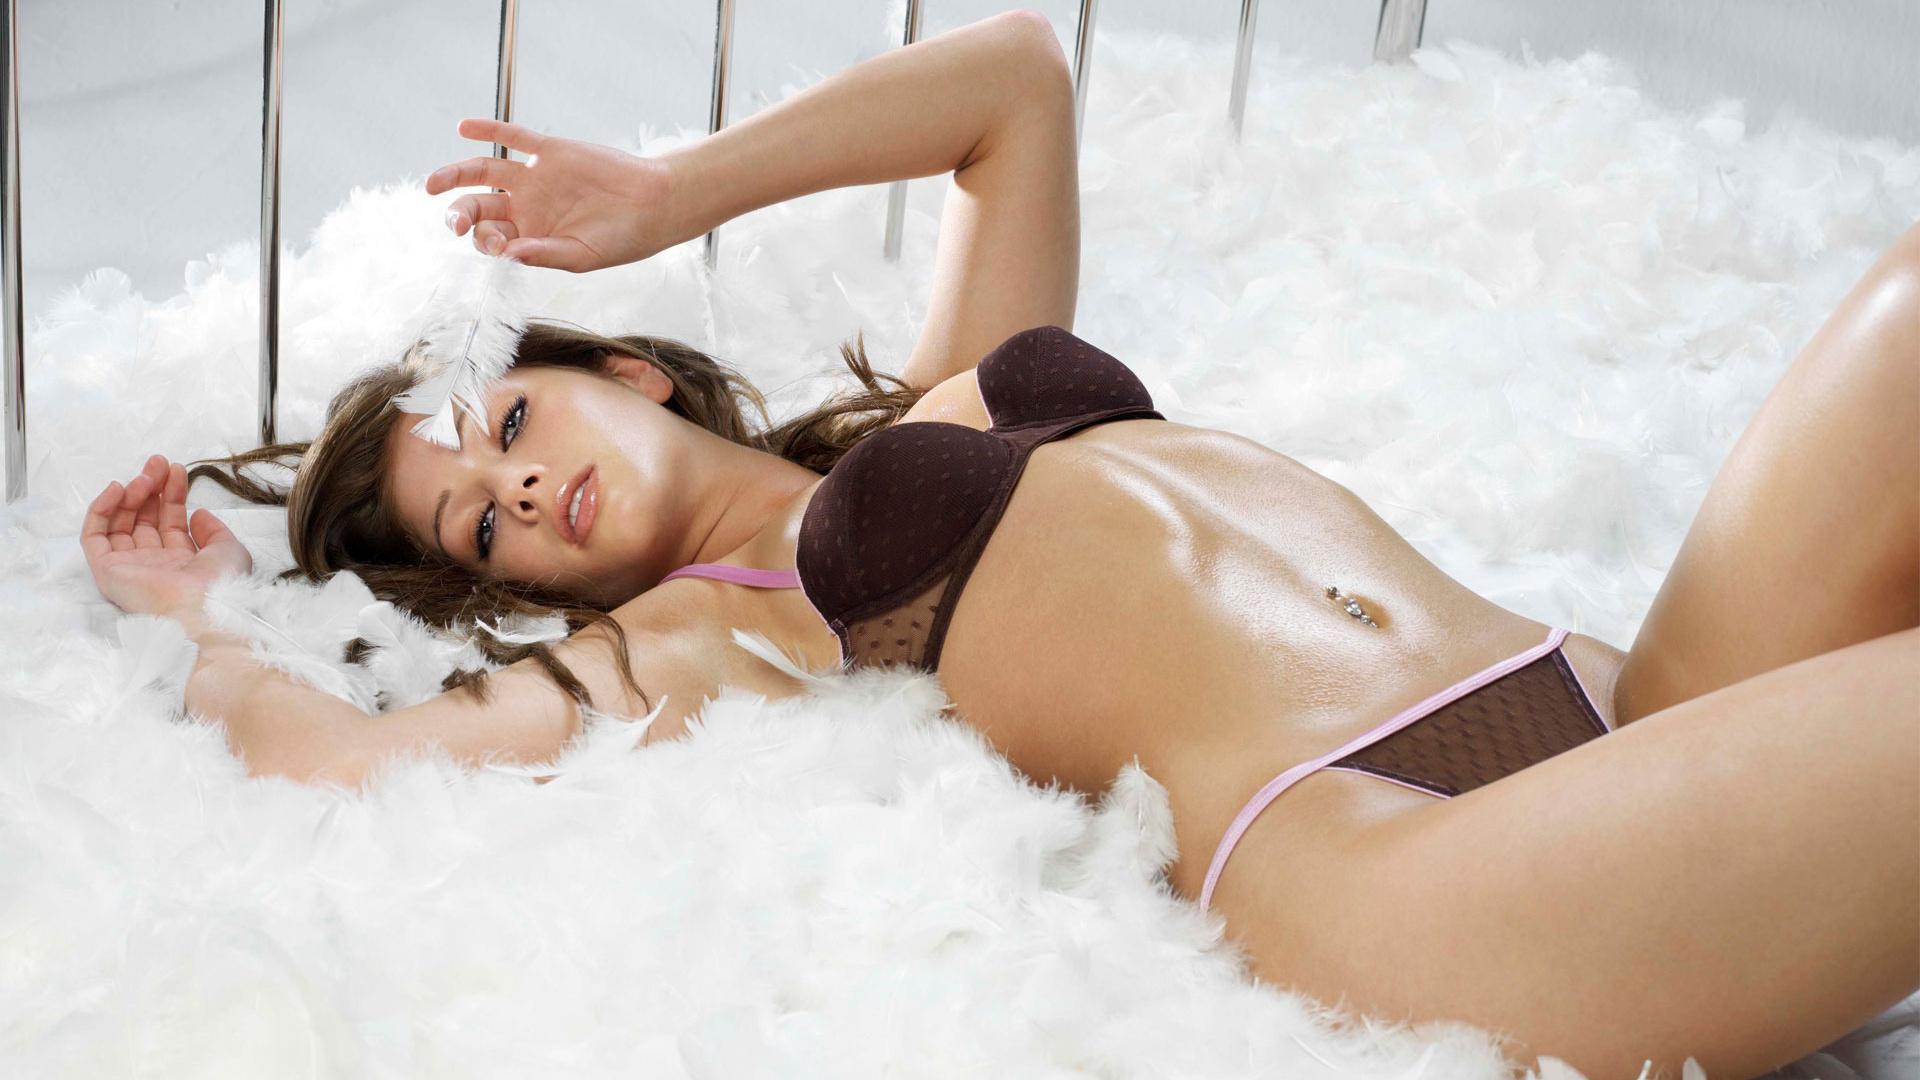 Ftop ru lingerie girls